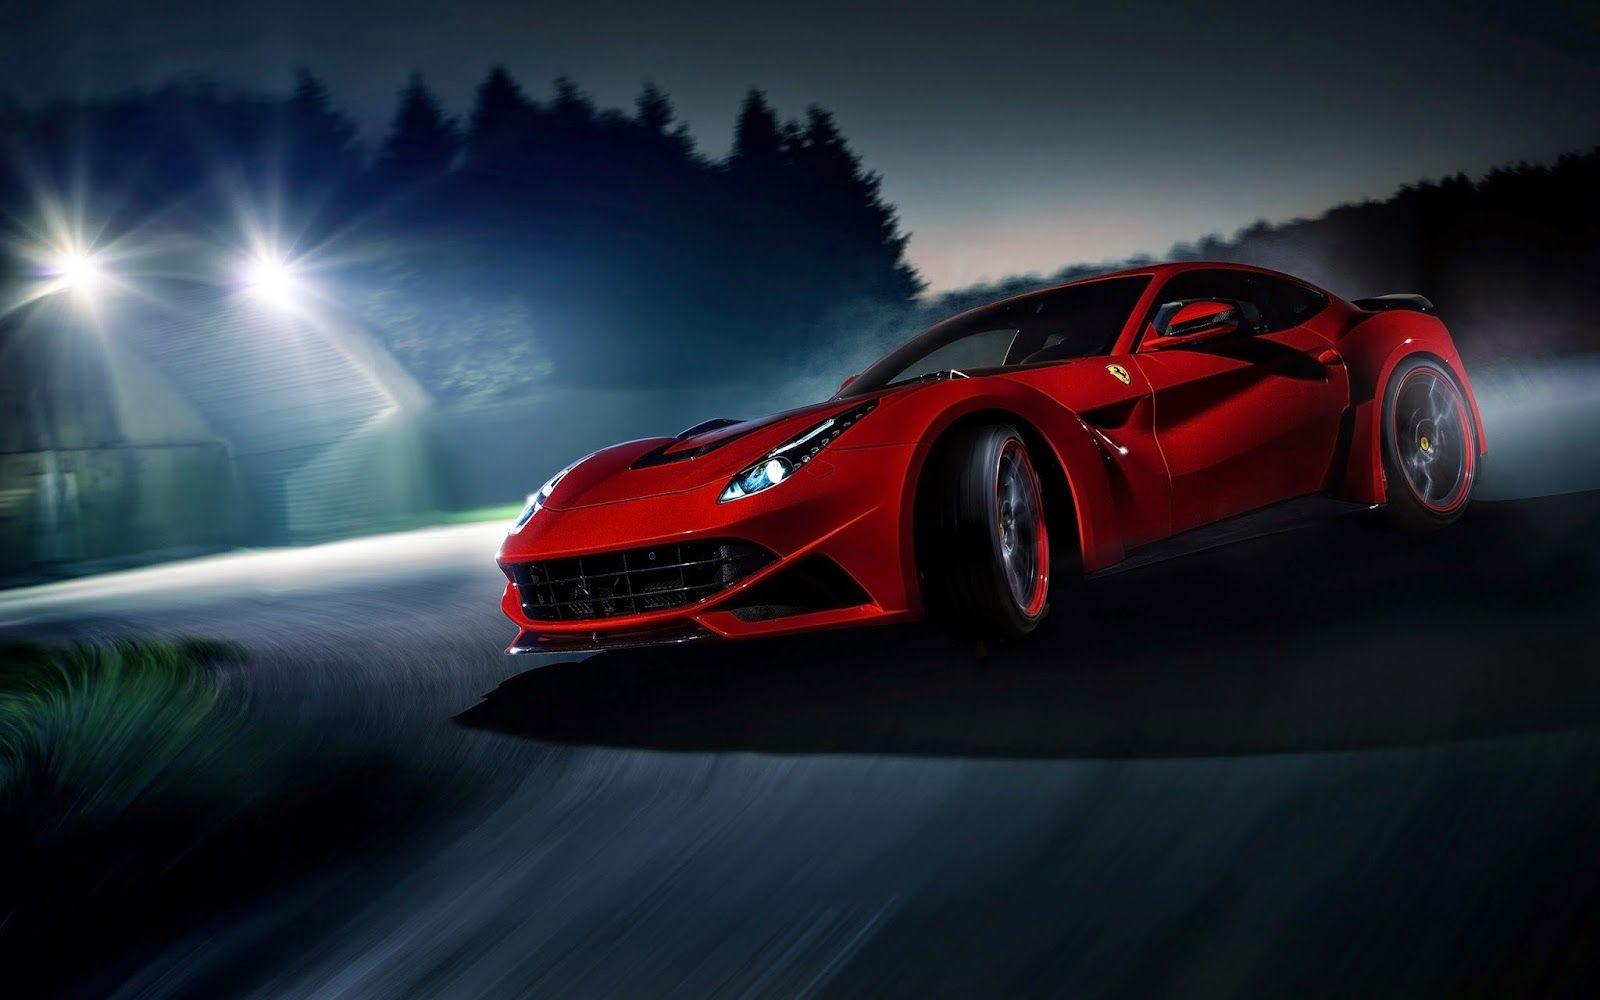 Gambar Mobil Balap Mobil Sport Dan Mobil Mewah Yang Keren Ferrari F12berlinetta Fondos De Pantalla De Coches Largos